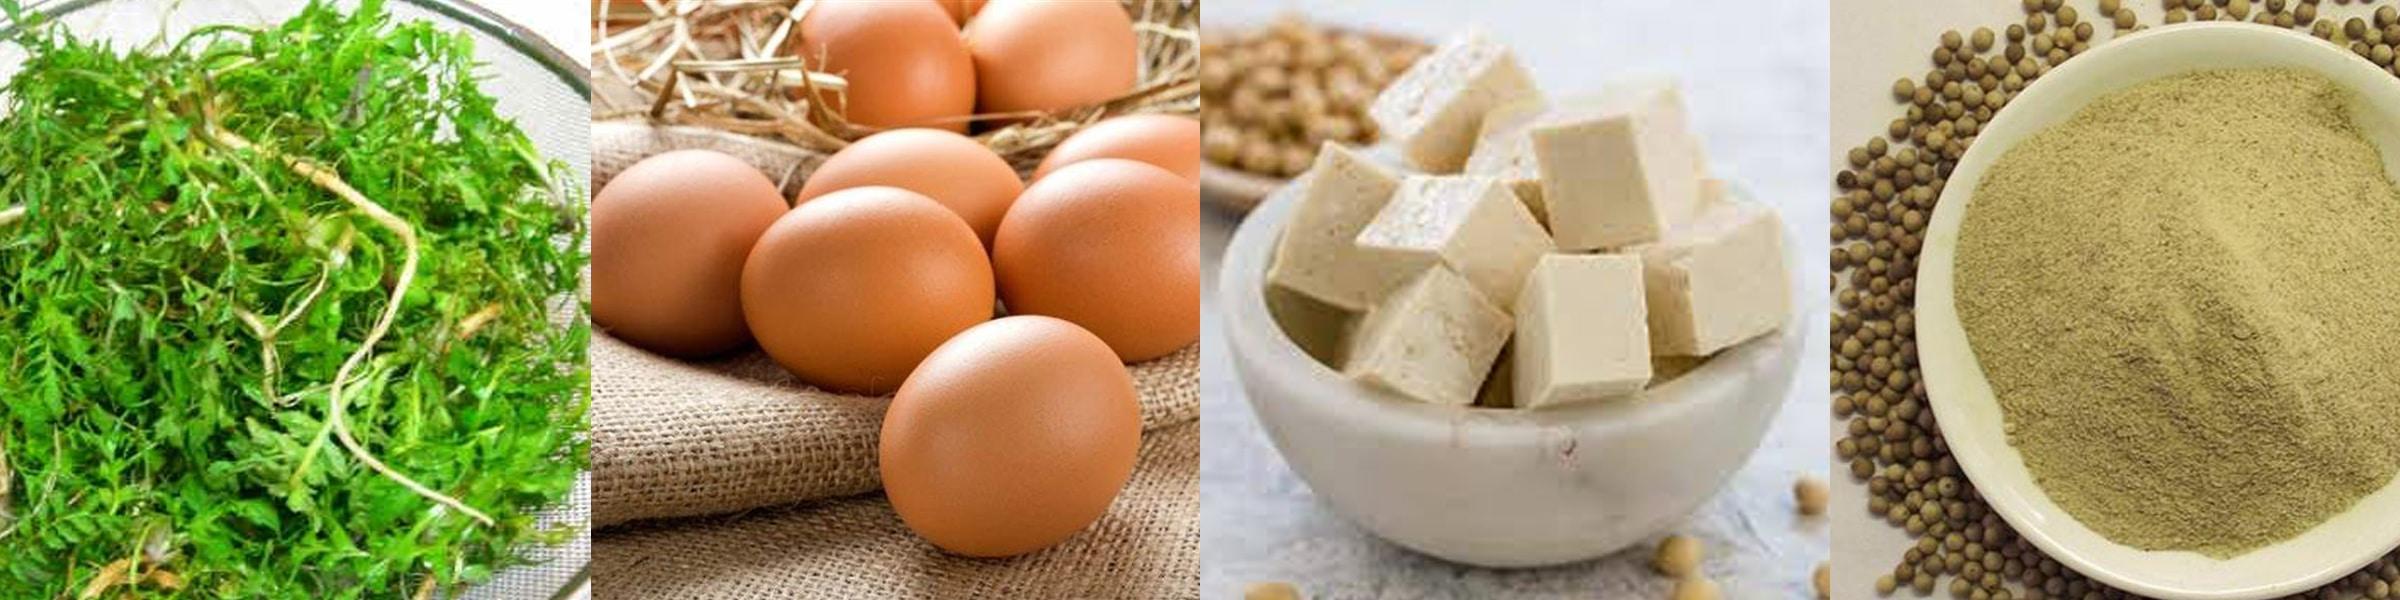 Ingredients Of Shepherd's Purse Tofu Soup